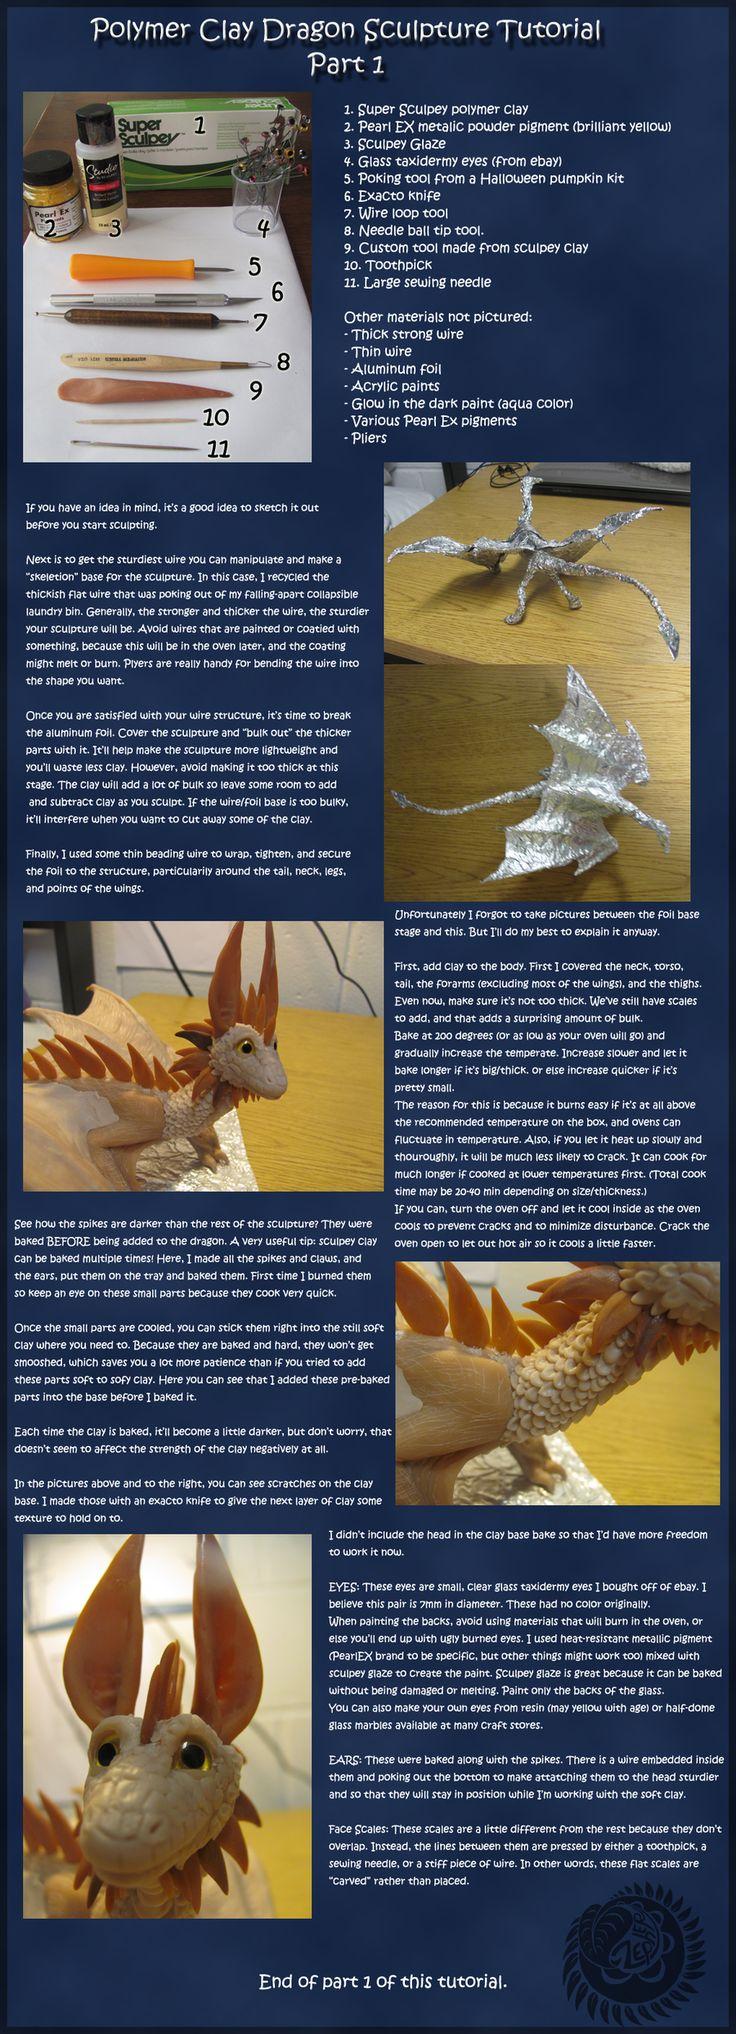 Dragon Sculpture Tutorial: Part 1 by OoZepheroO.deviantart.com on @deviantART